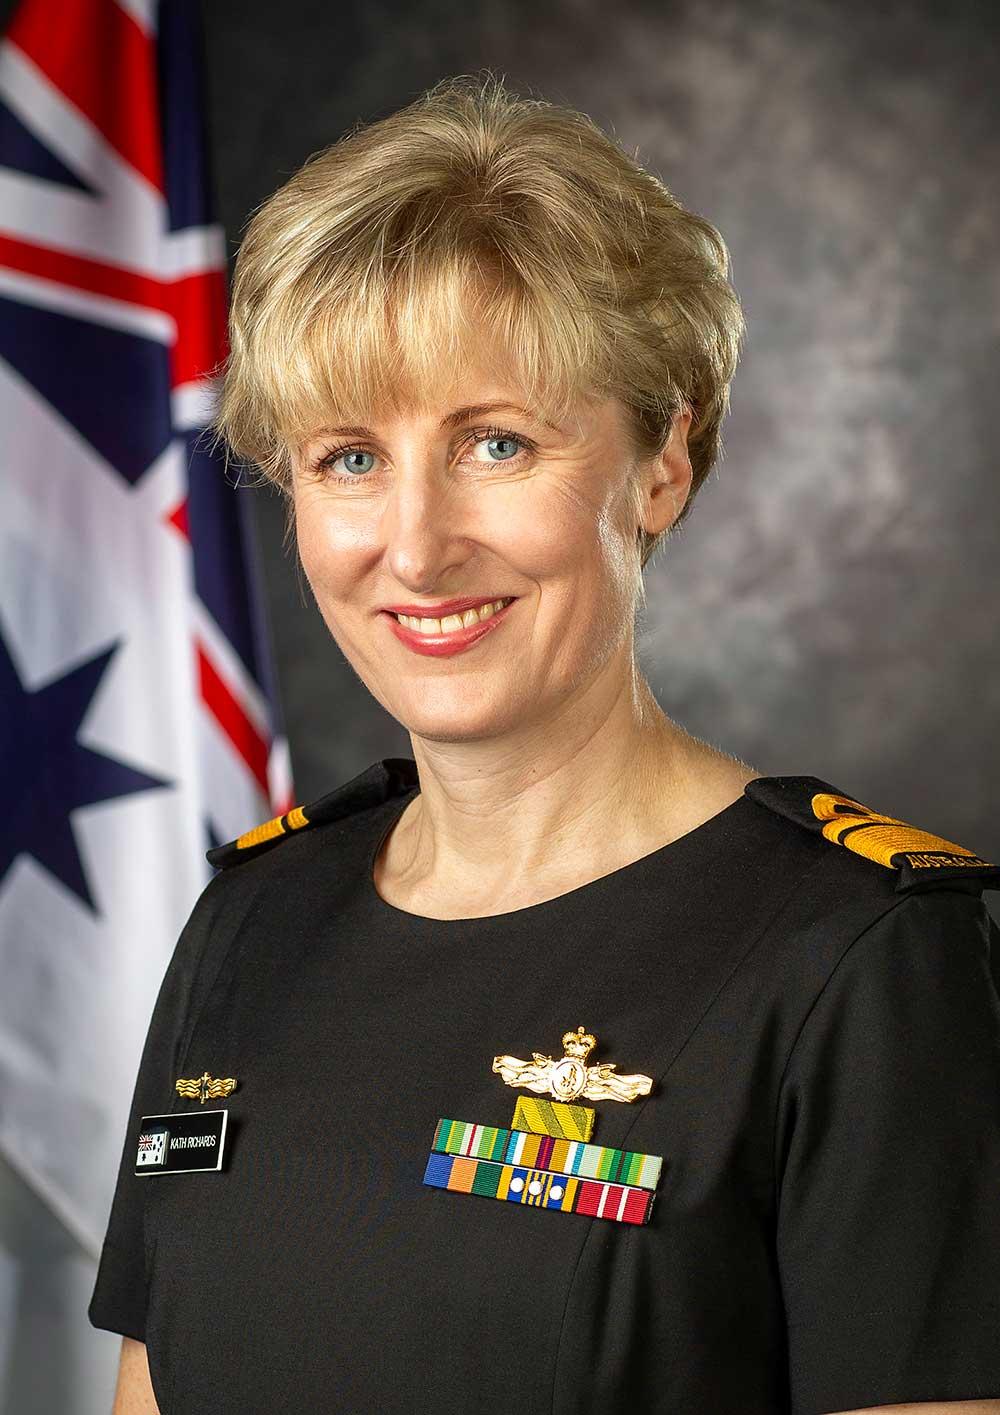 Rear Admiral Kath Richards FIEAust, Head of Navy Engineering